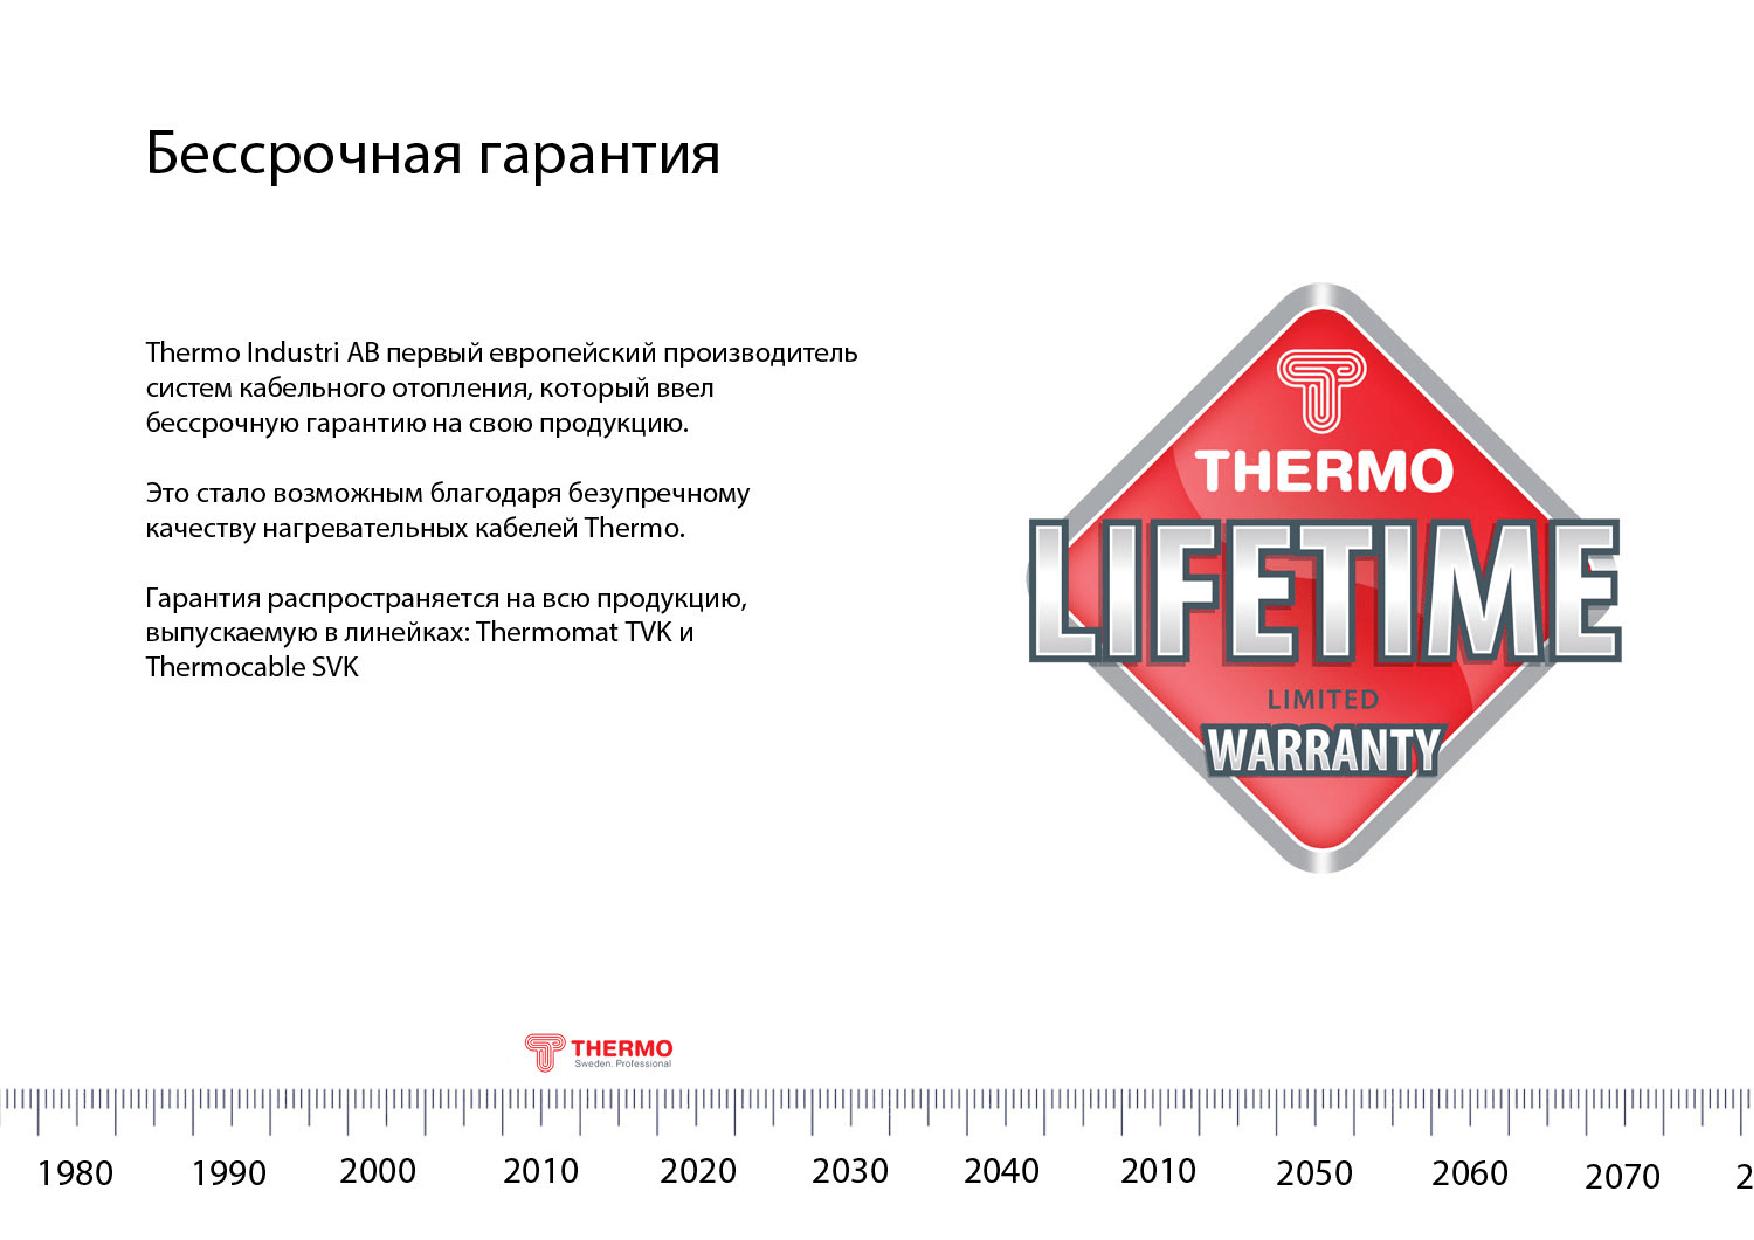 Bessrochnaya-garantiya